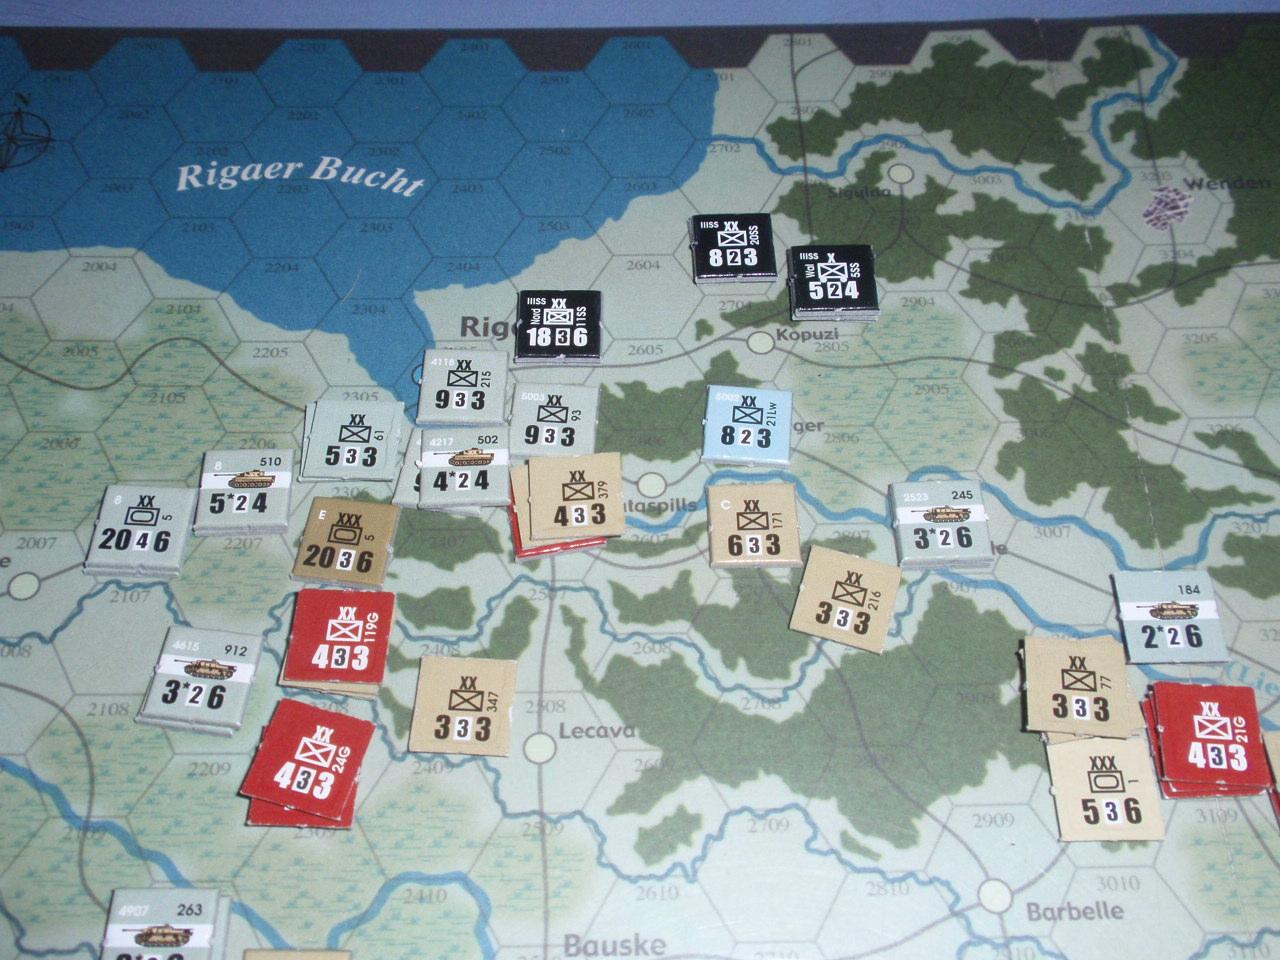 MIH/CMJ「Drive to the Baltic!」をソロプレイ③_b0162202_10421793.jpg